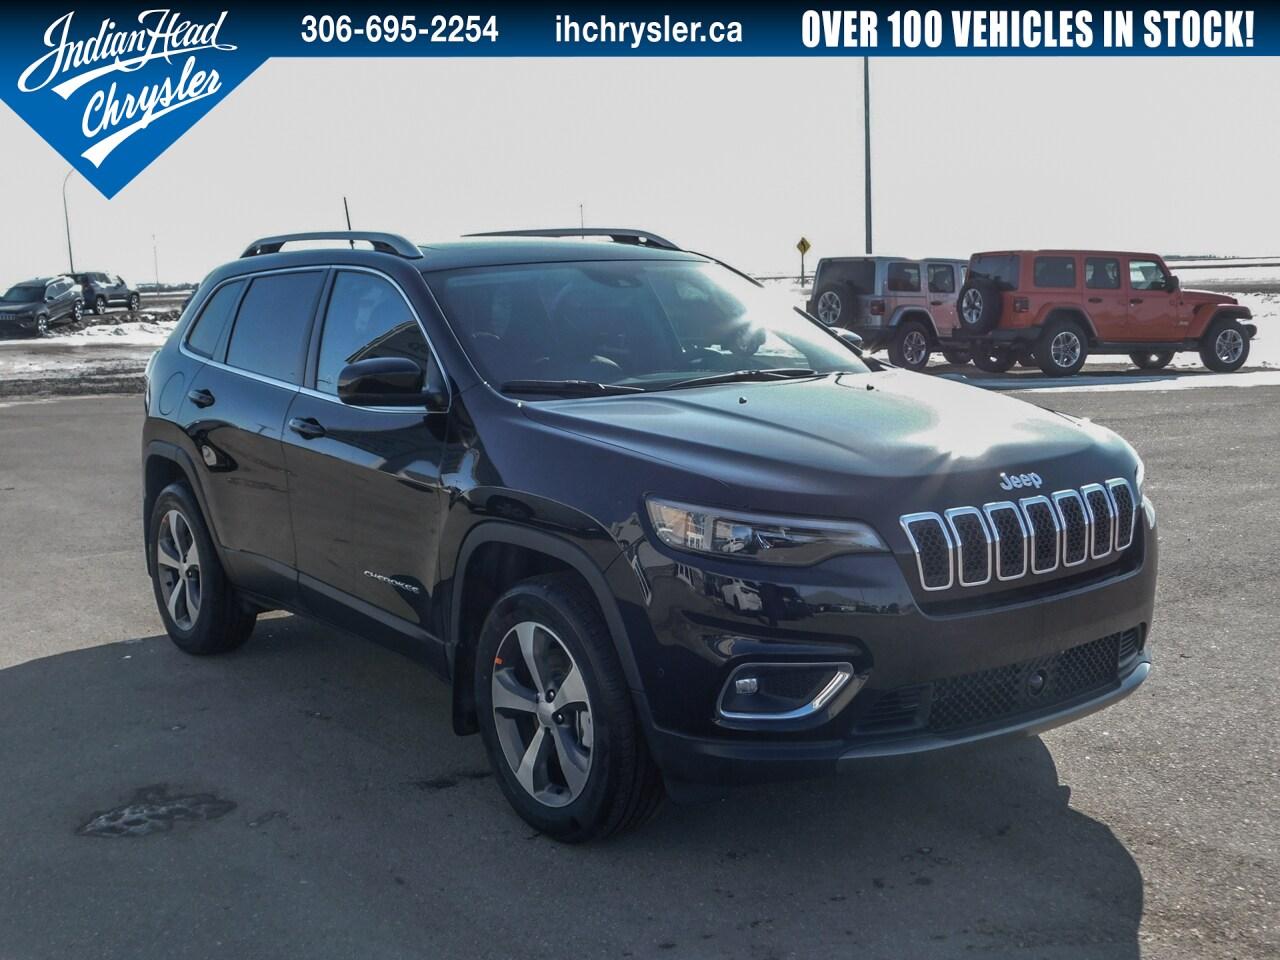 2020 Jeep Cherokee Limited 4x4 | Leather | Nav | Bluetooth VUS